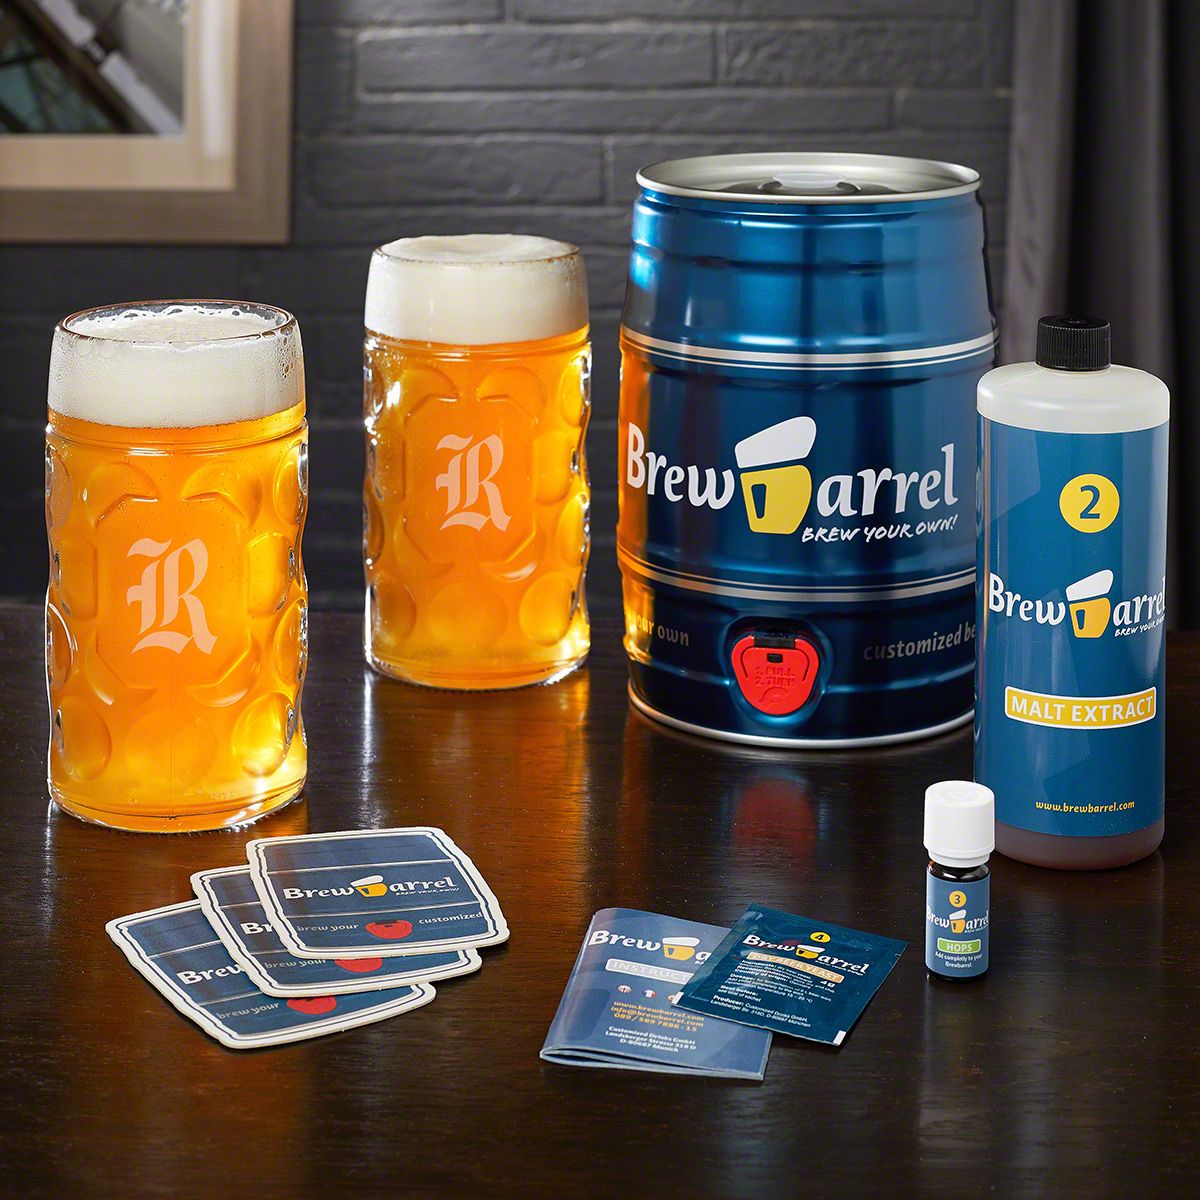 Brew Barrel Beer Making Kit and Custom Oktoberfest Beer Stein Set